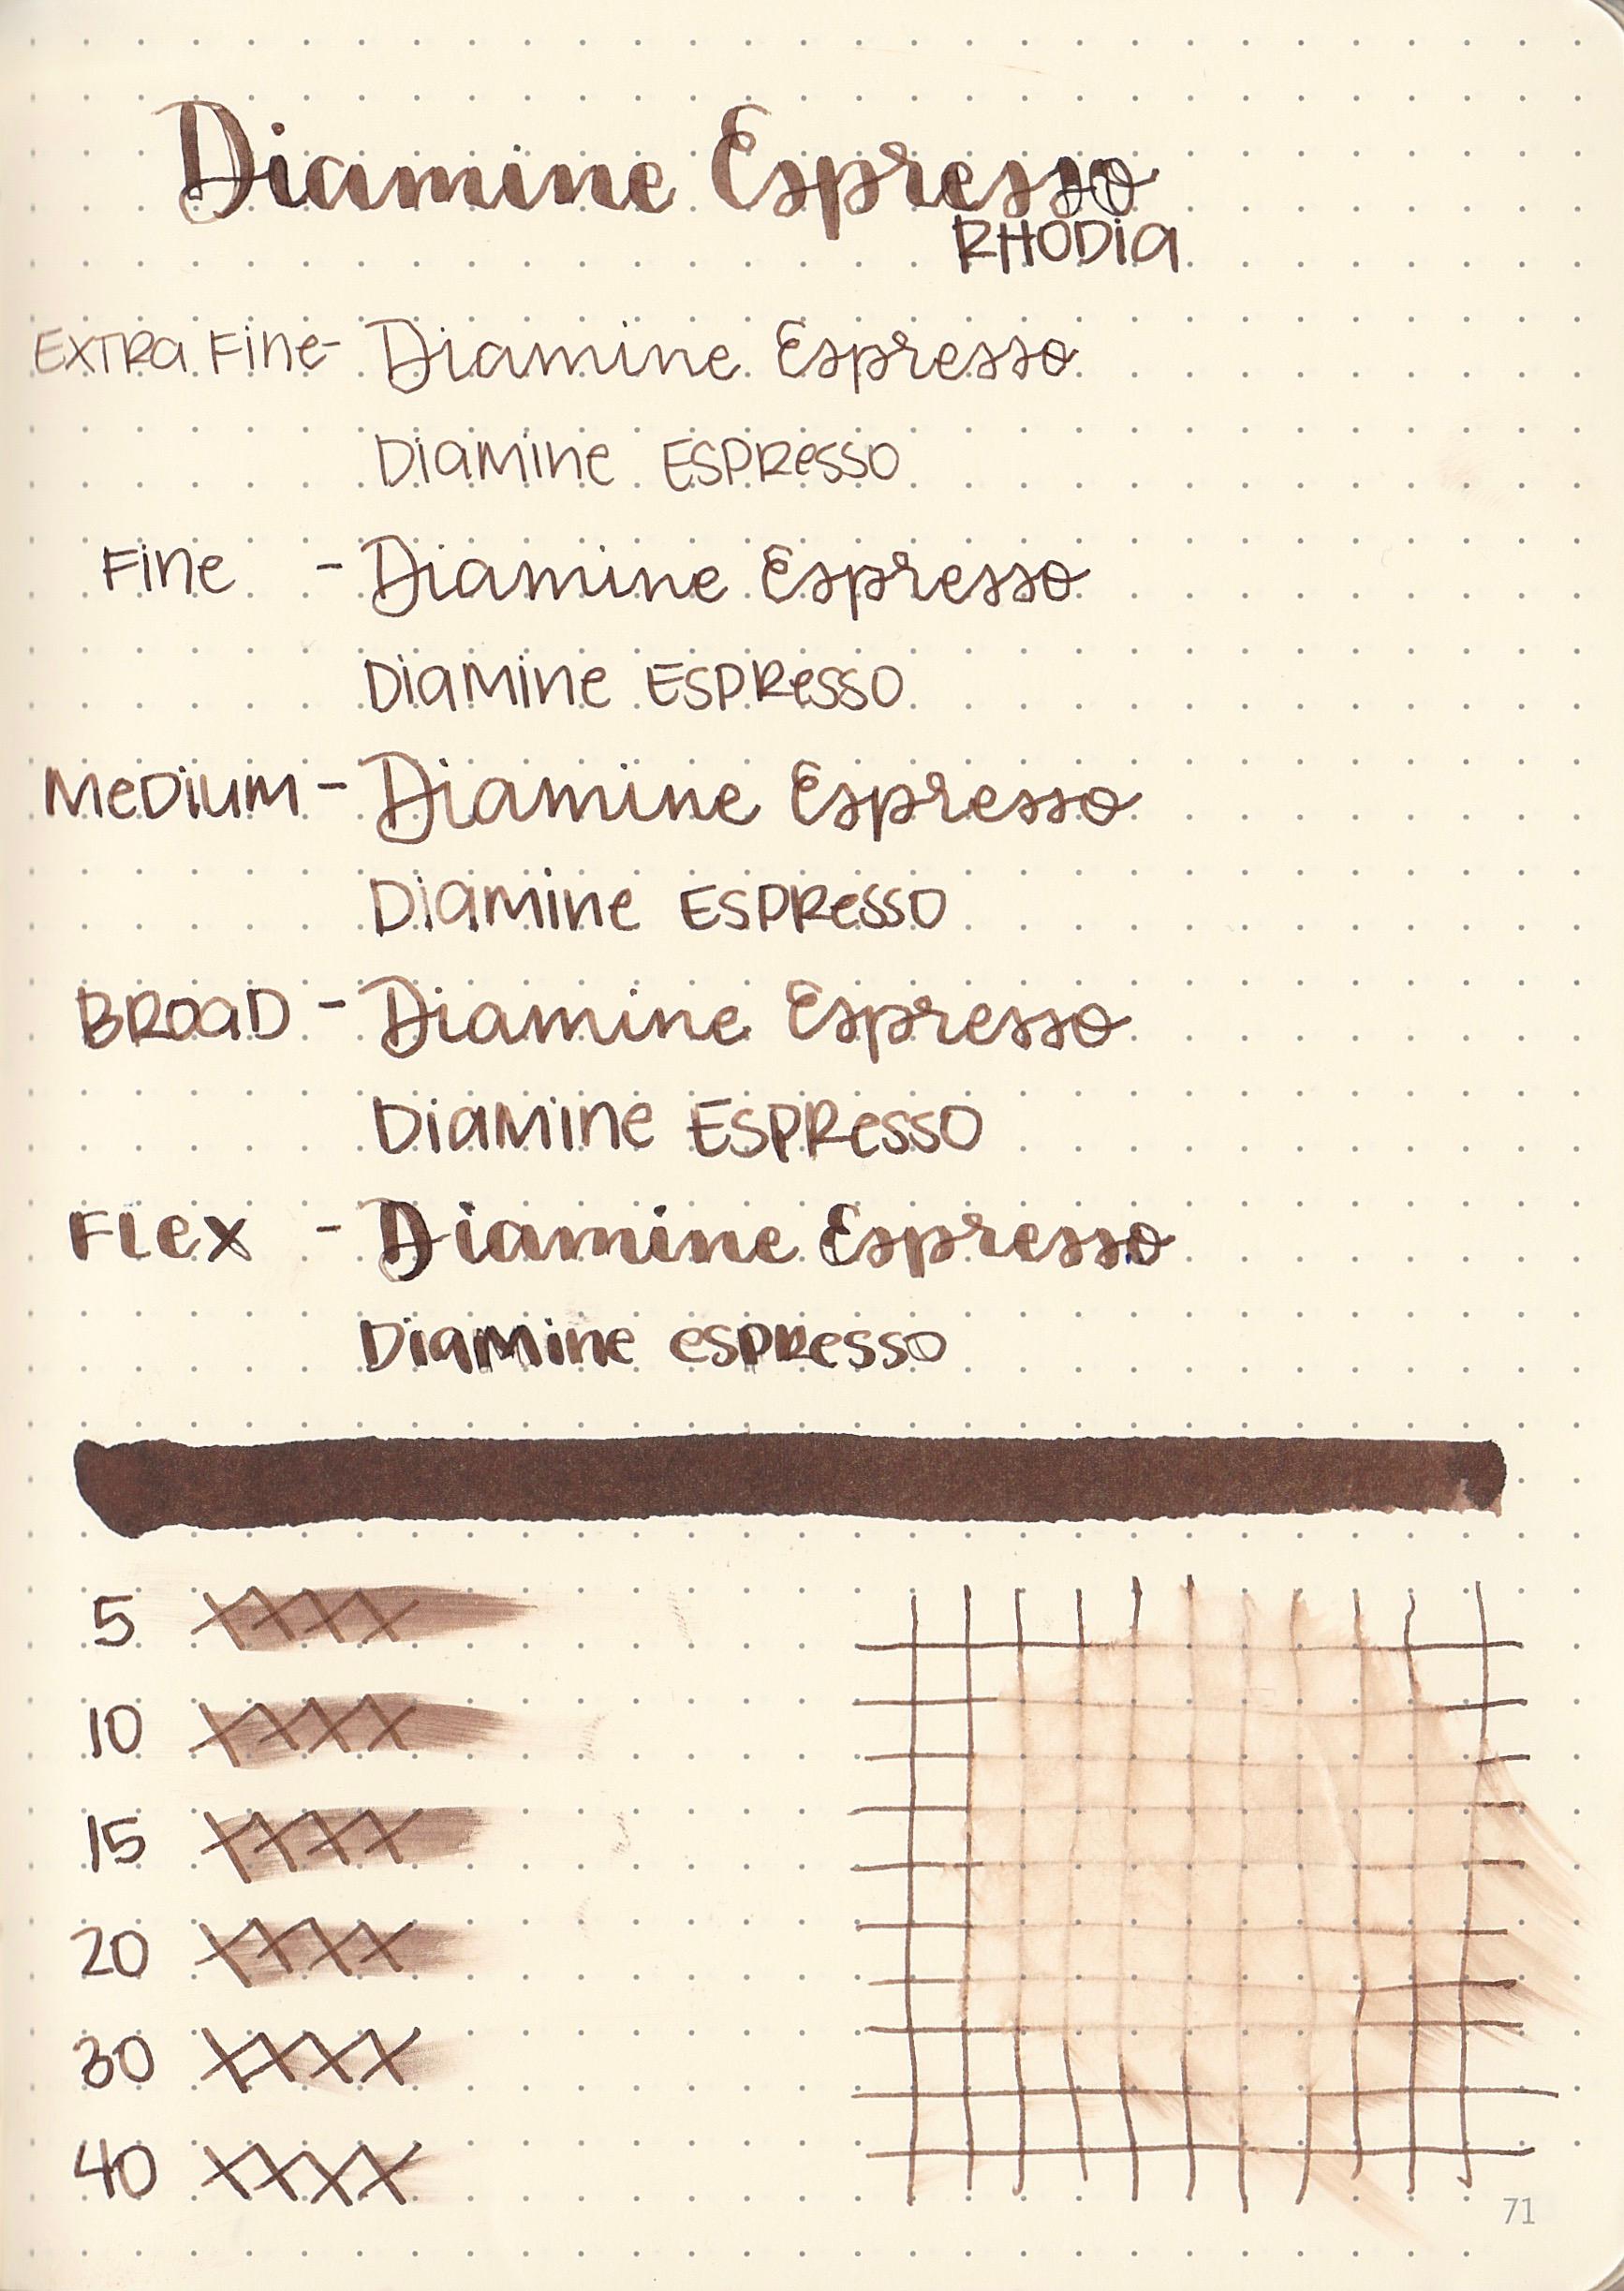 DEspresso - 5.jpg